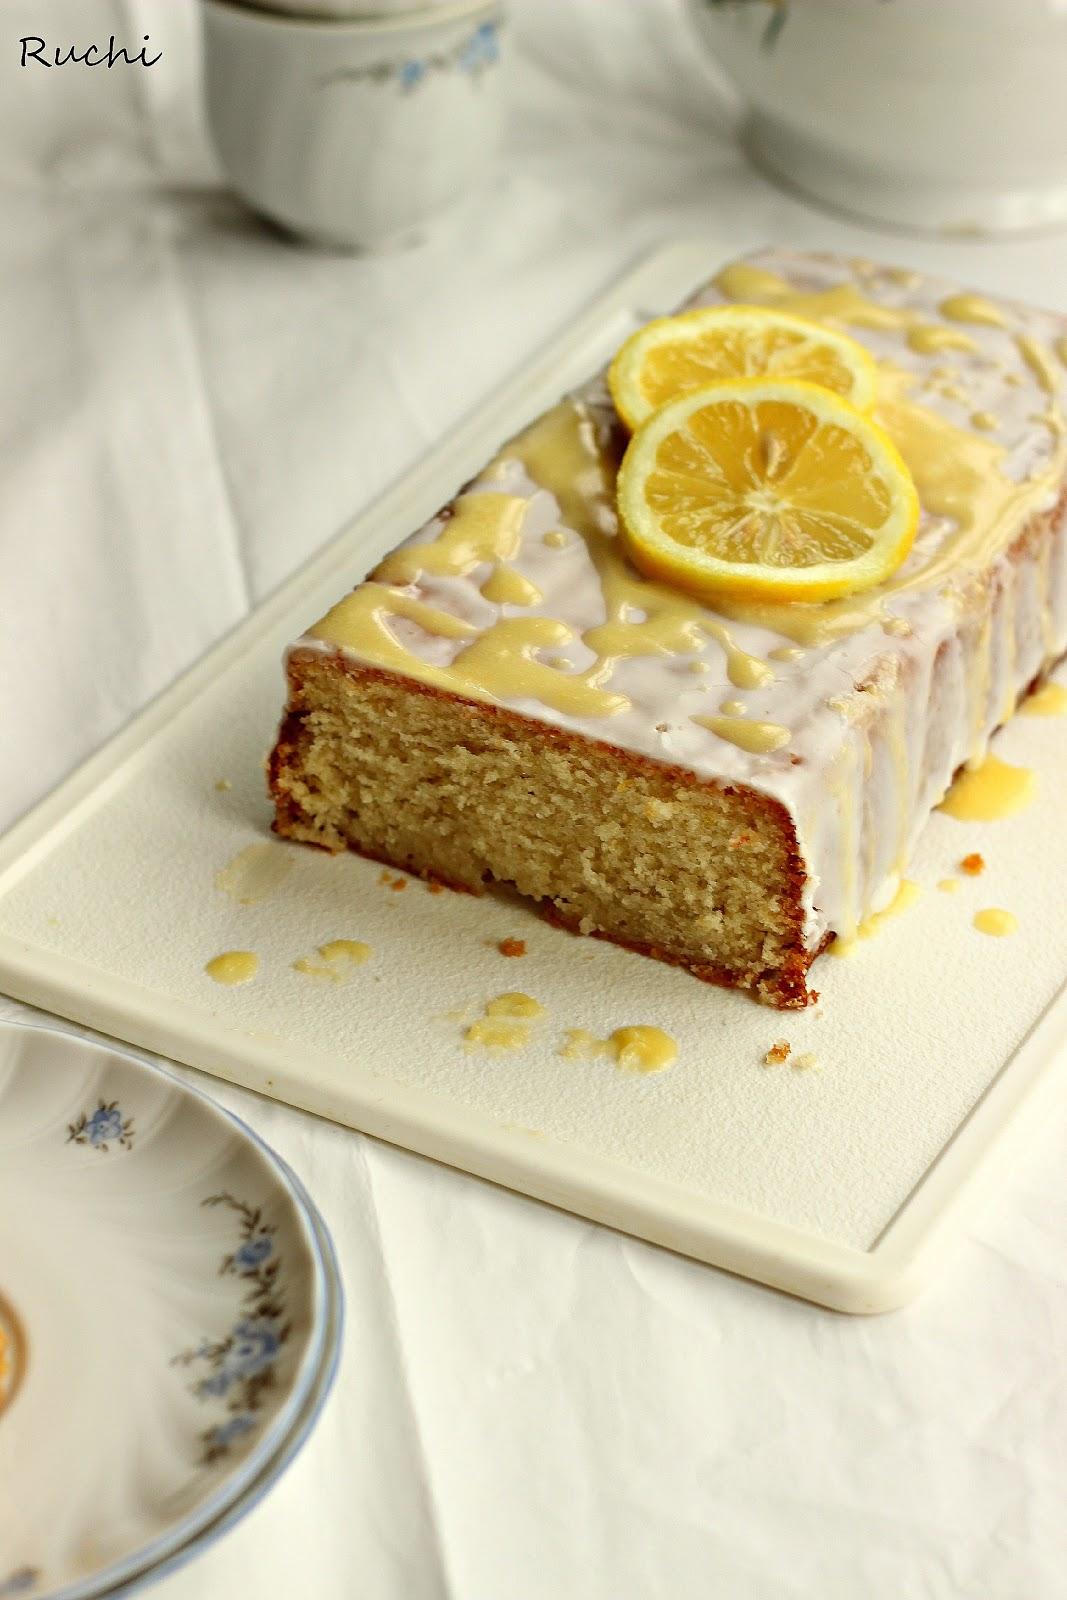 RUCHI: Lemon Cake